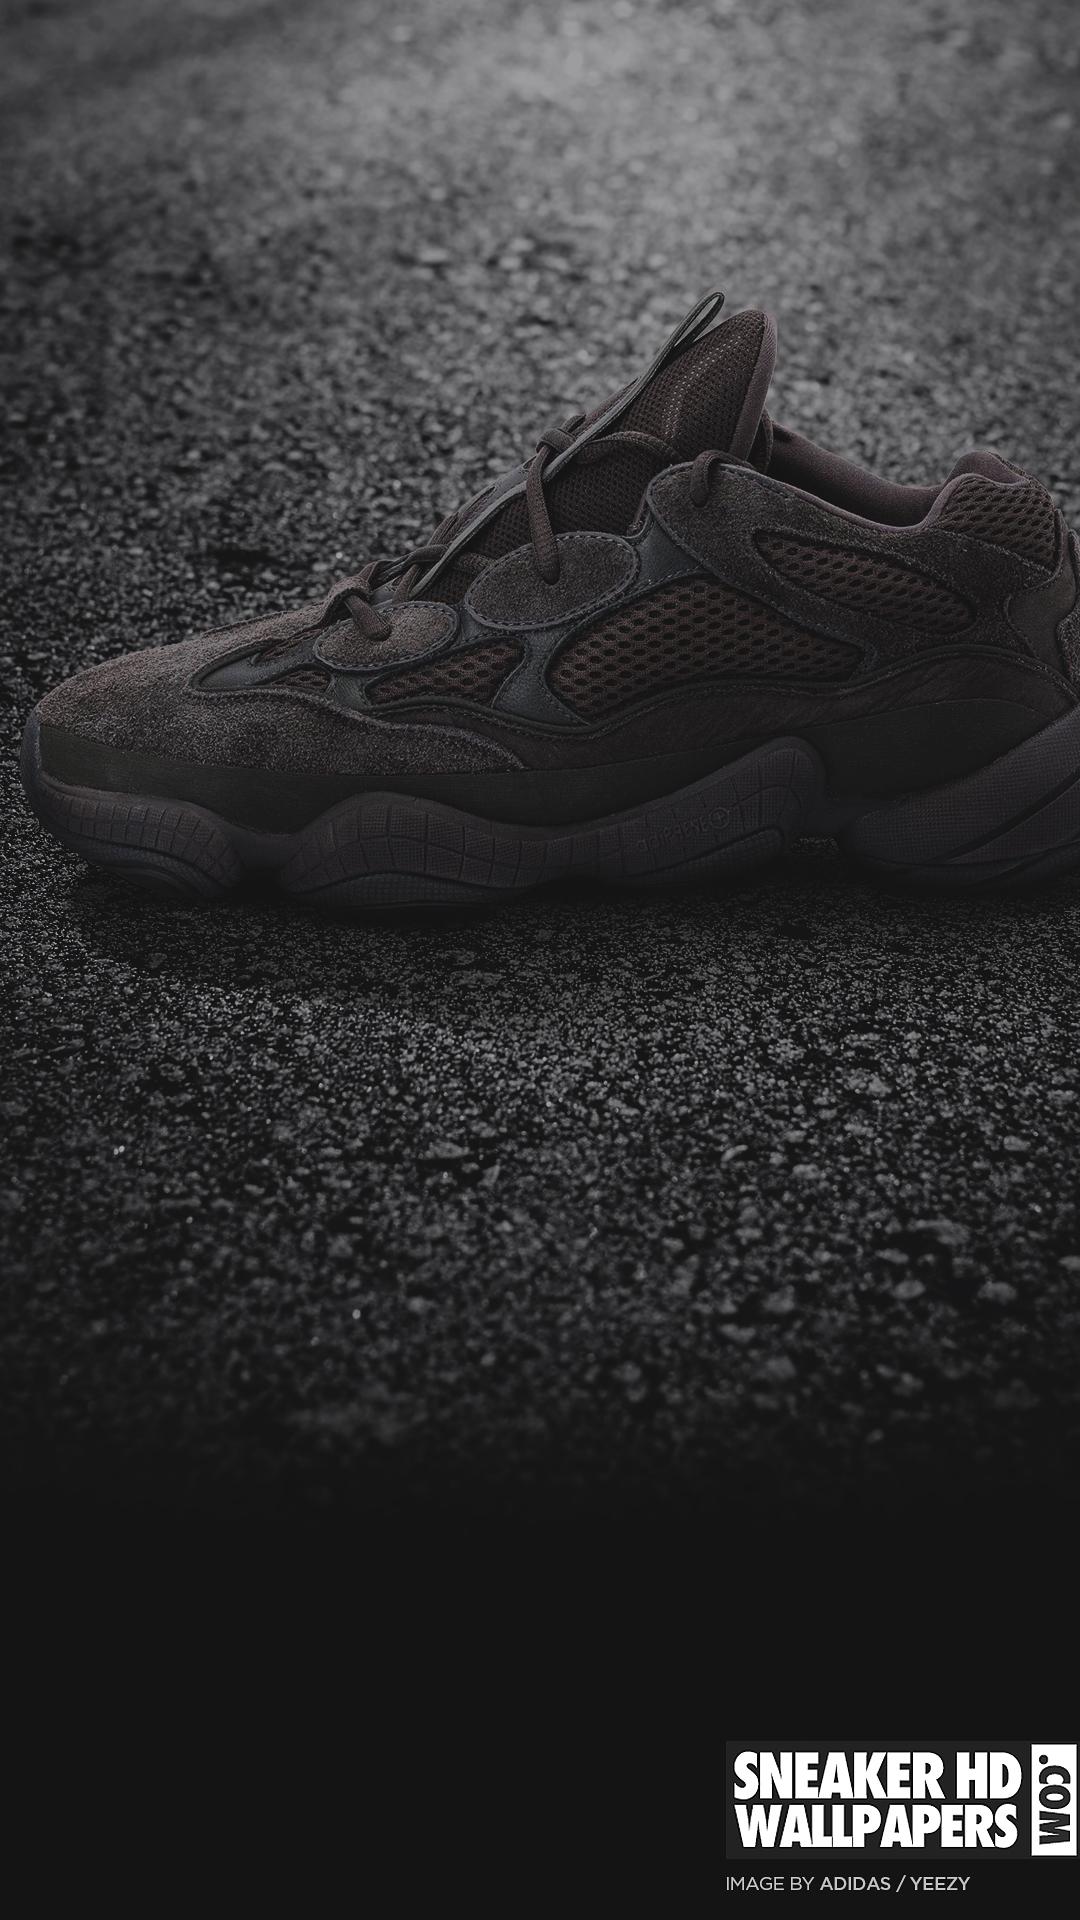 Sneakerhdwallpaperscom Your Favorite Sneakers In Hd And